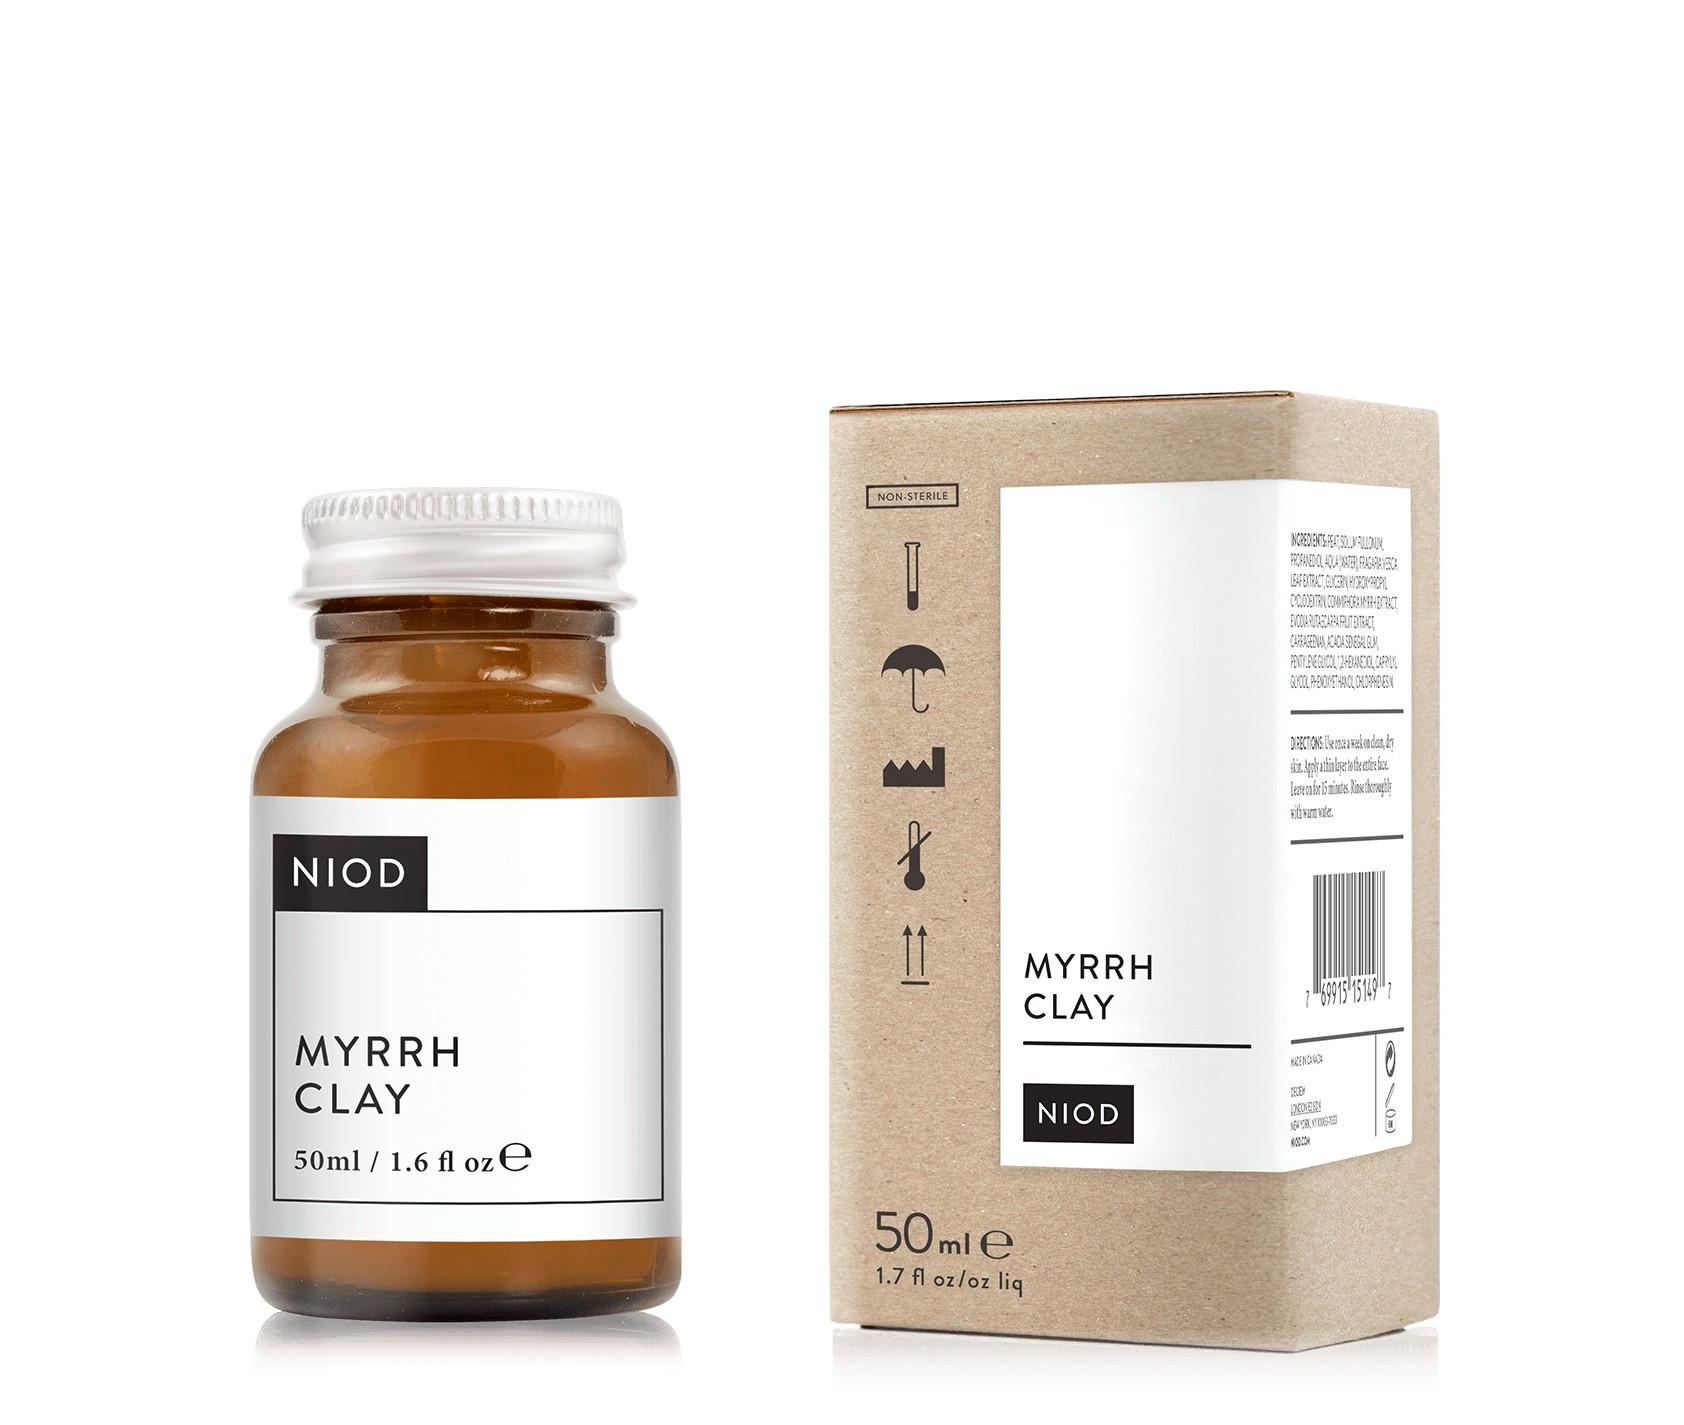 Myrrh Clay - NIOD